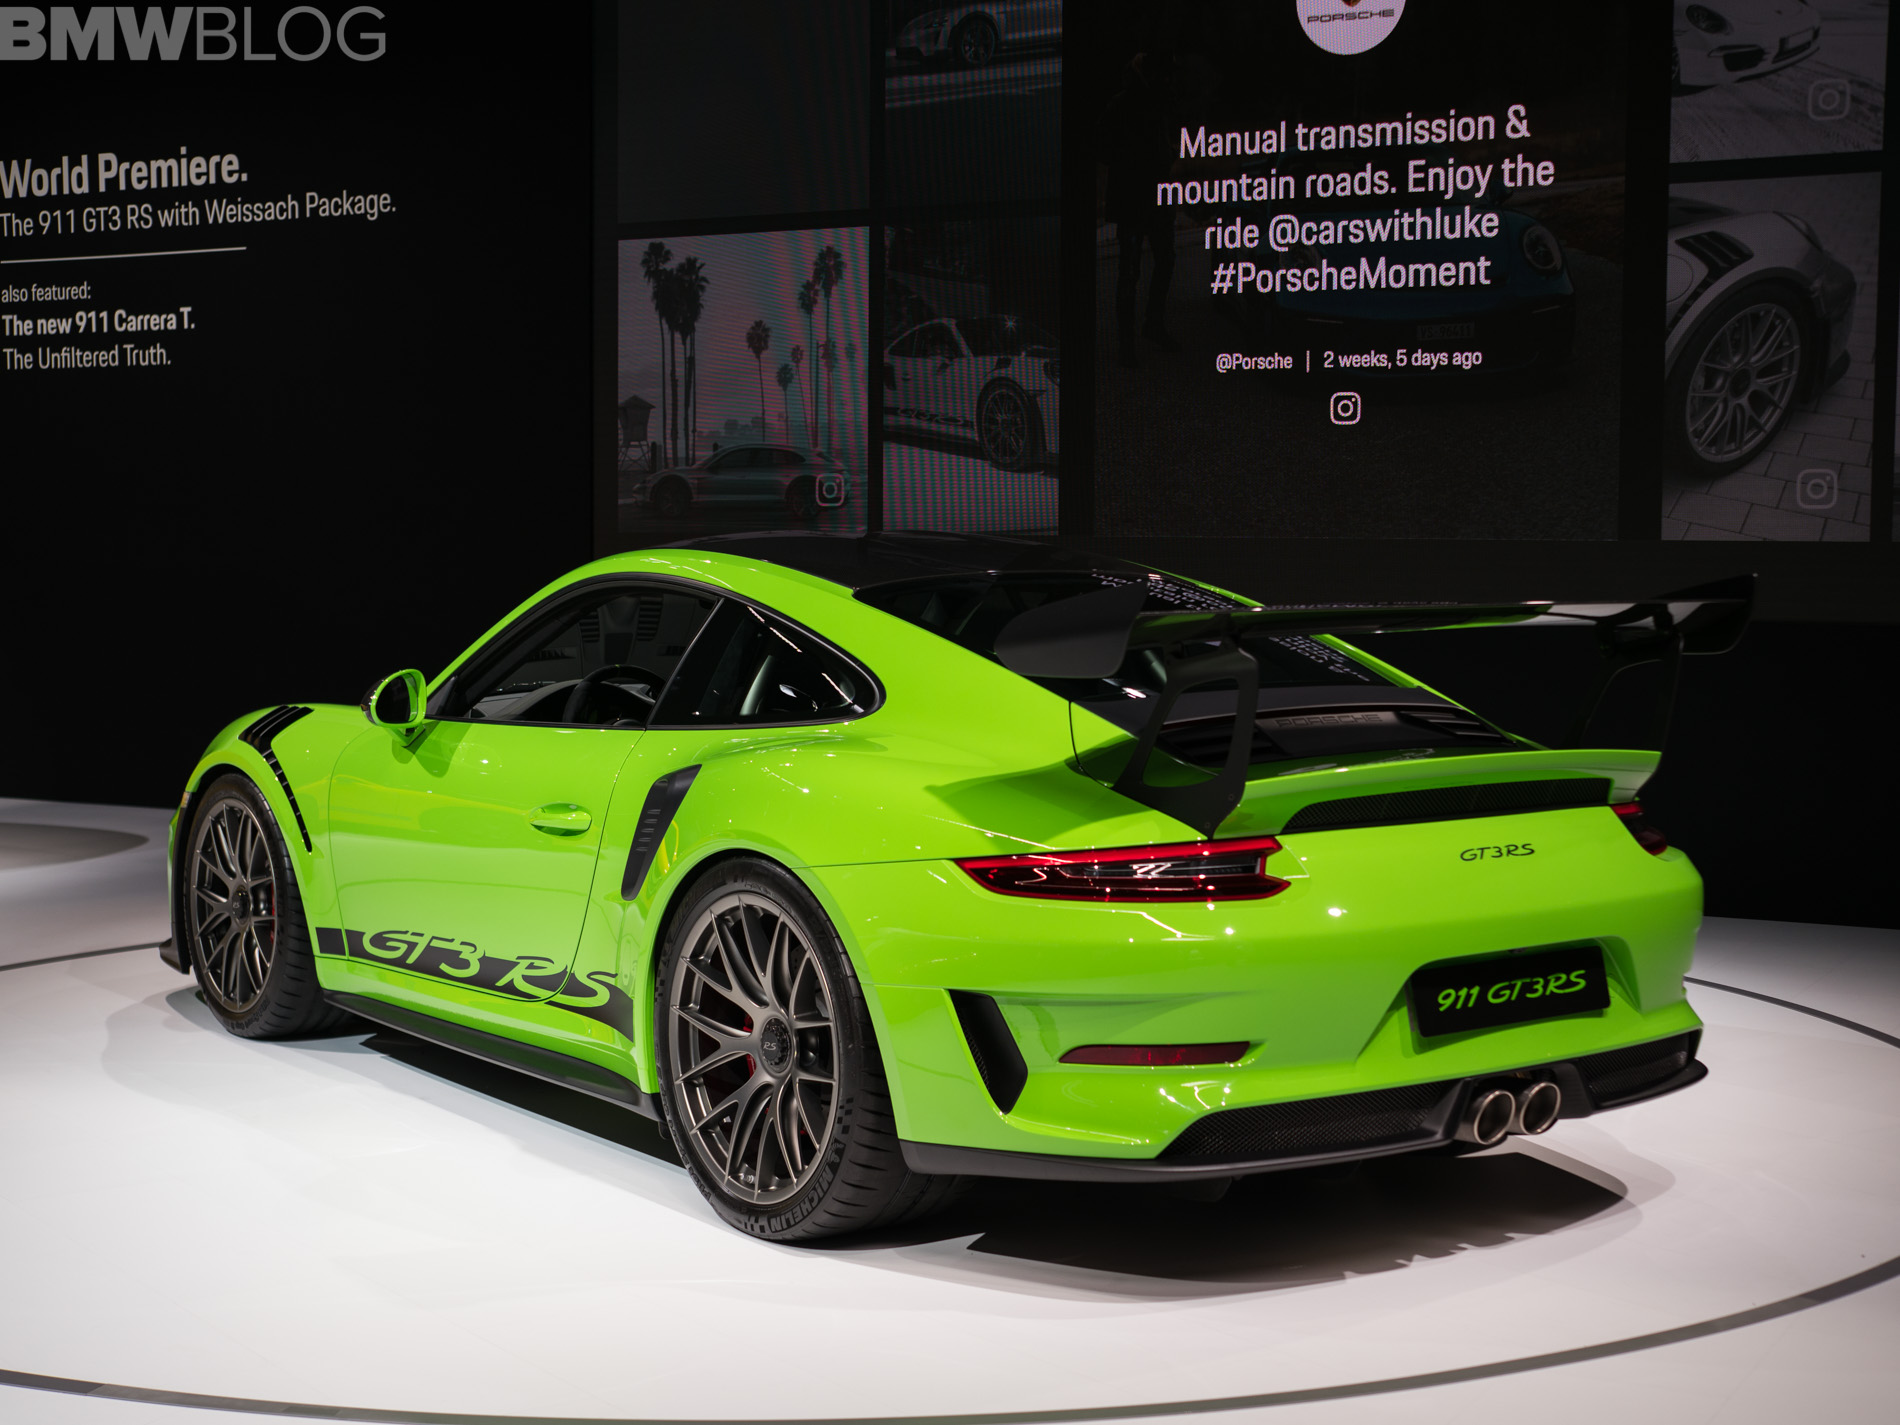 2018 Porsche 911 Gt3 >> 2018 NYIAS: Porsche 911 GT3 RS